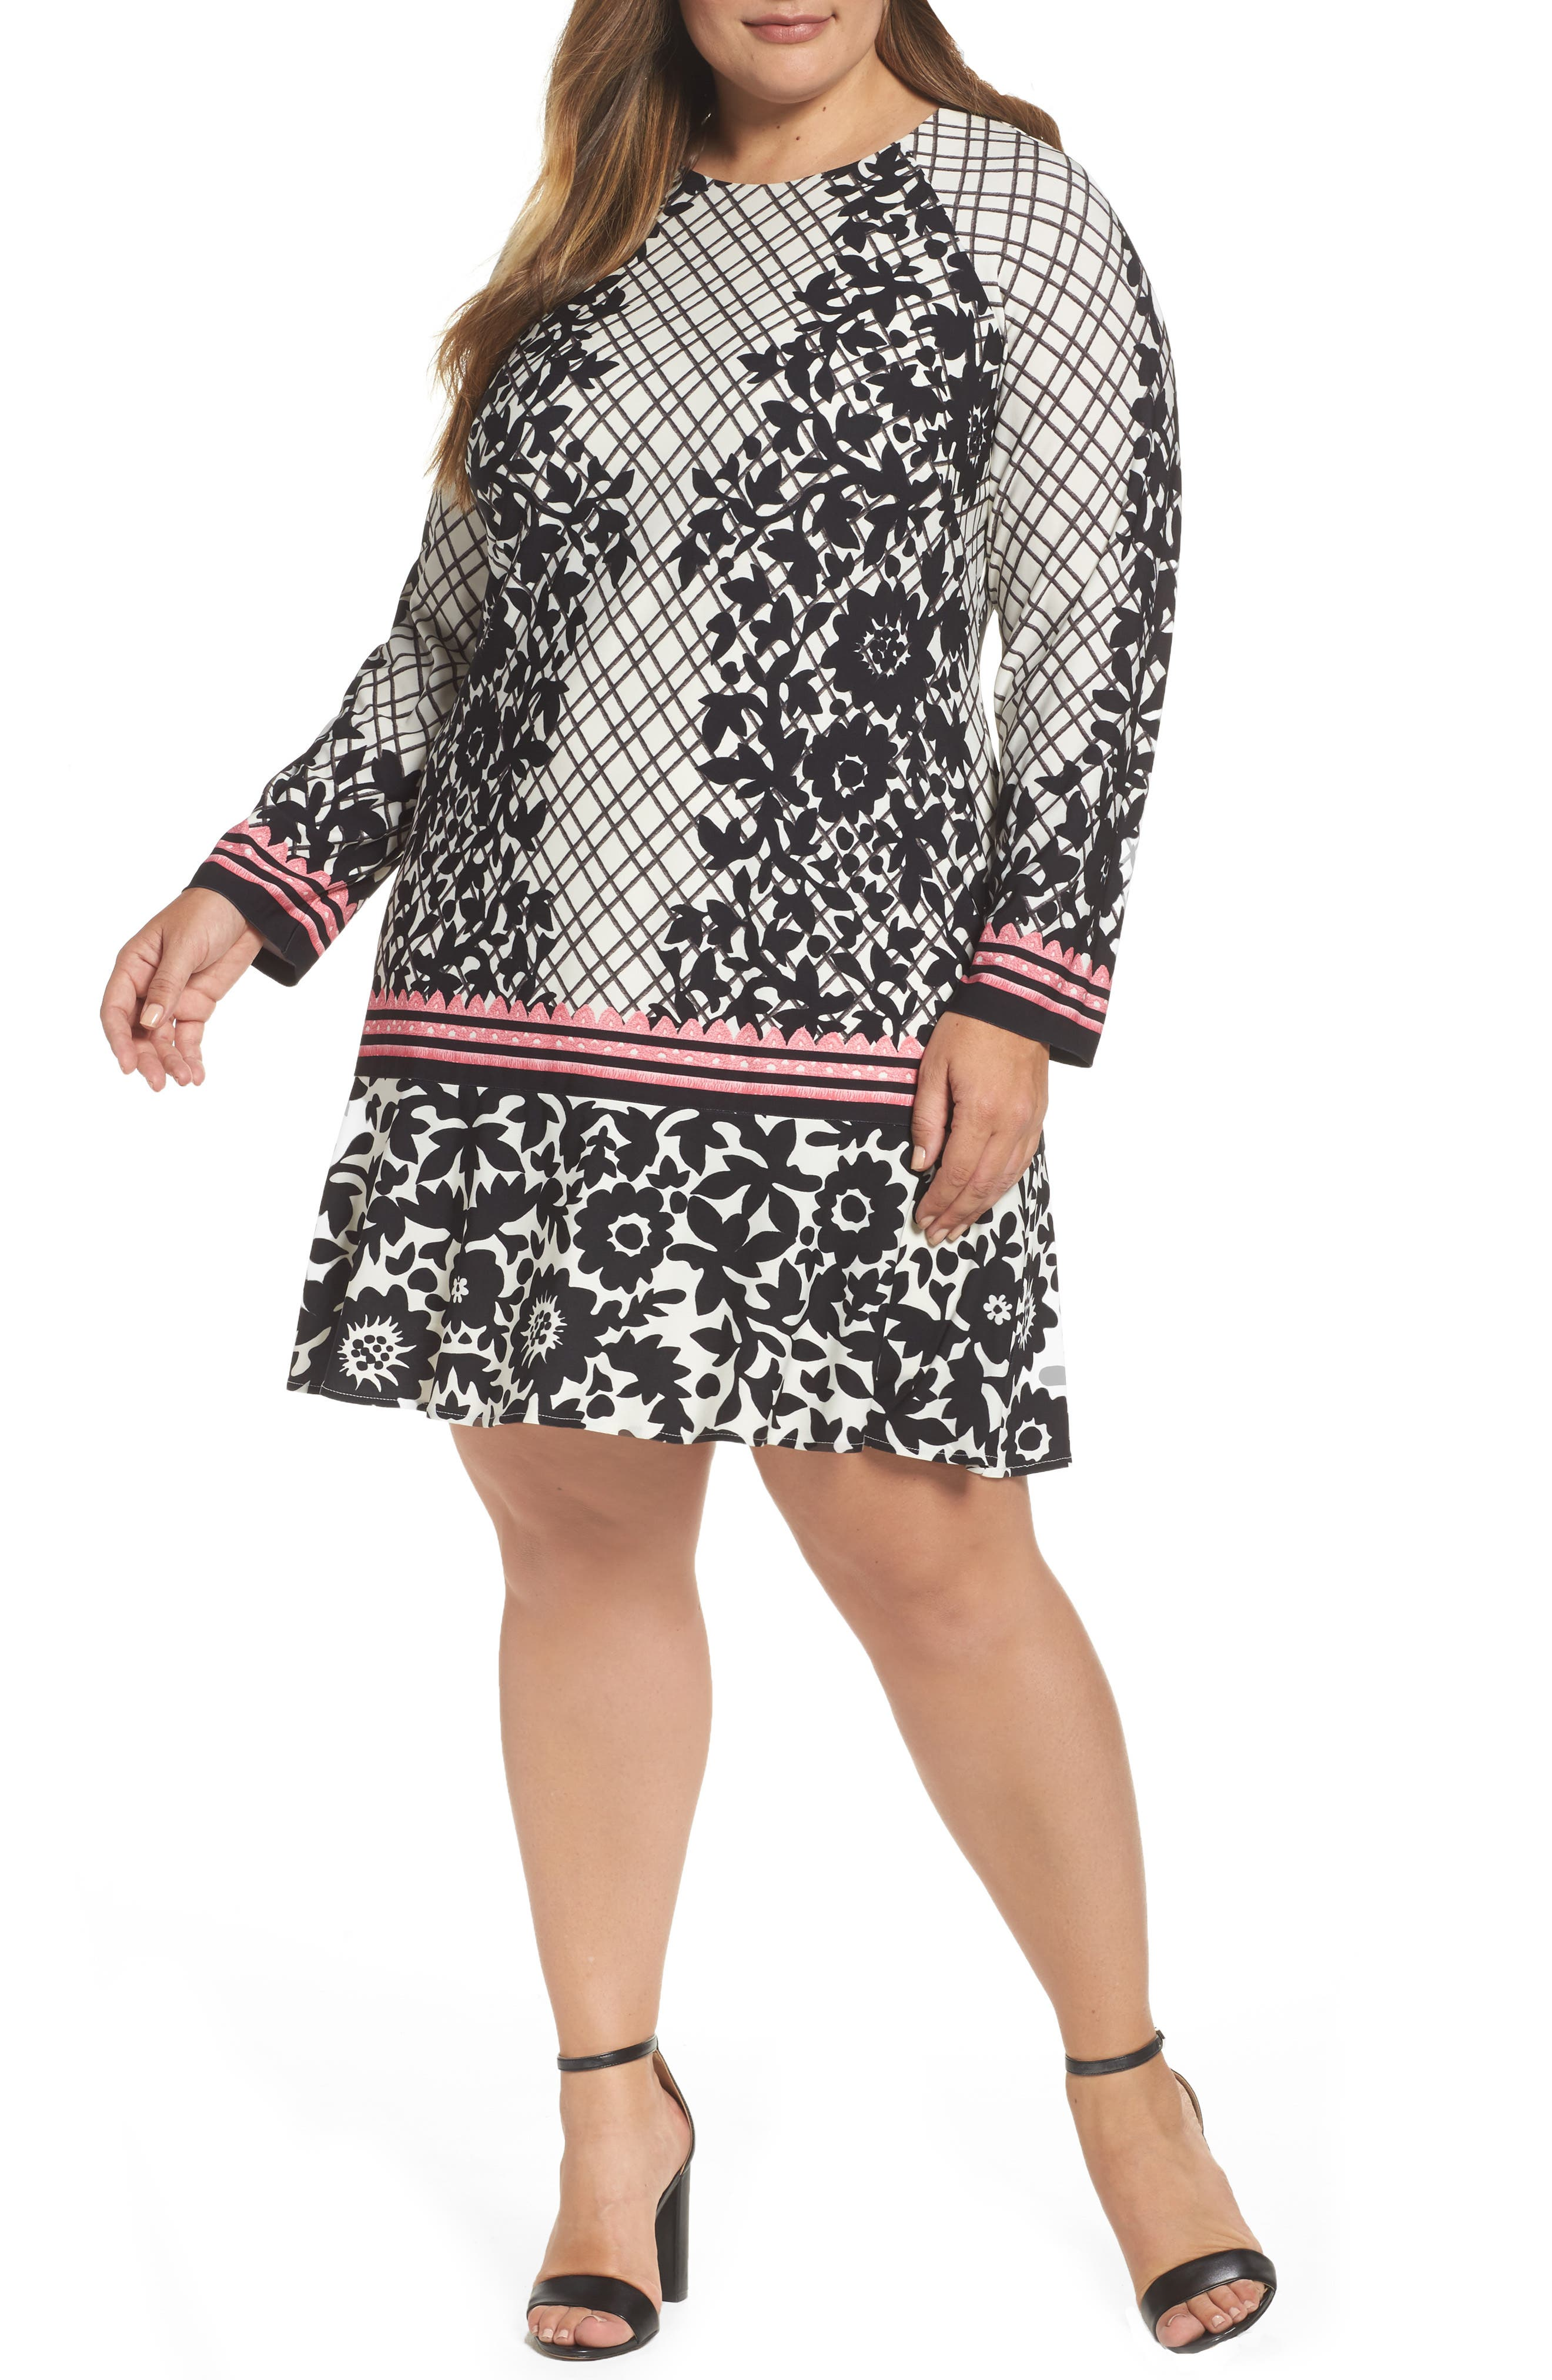 Alternate Image 1 Selected - Eliza J Lace Trim Shift Dress (Plus Size)